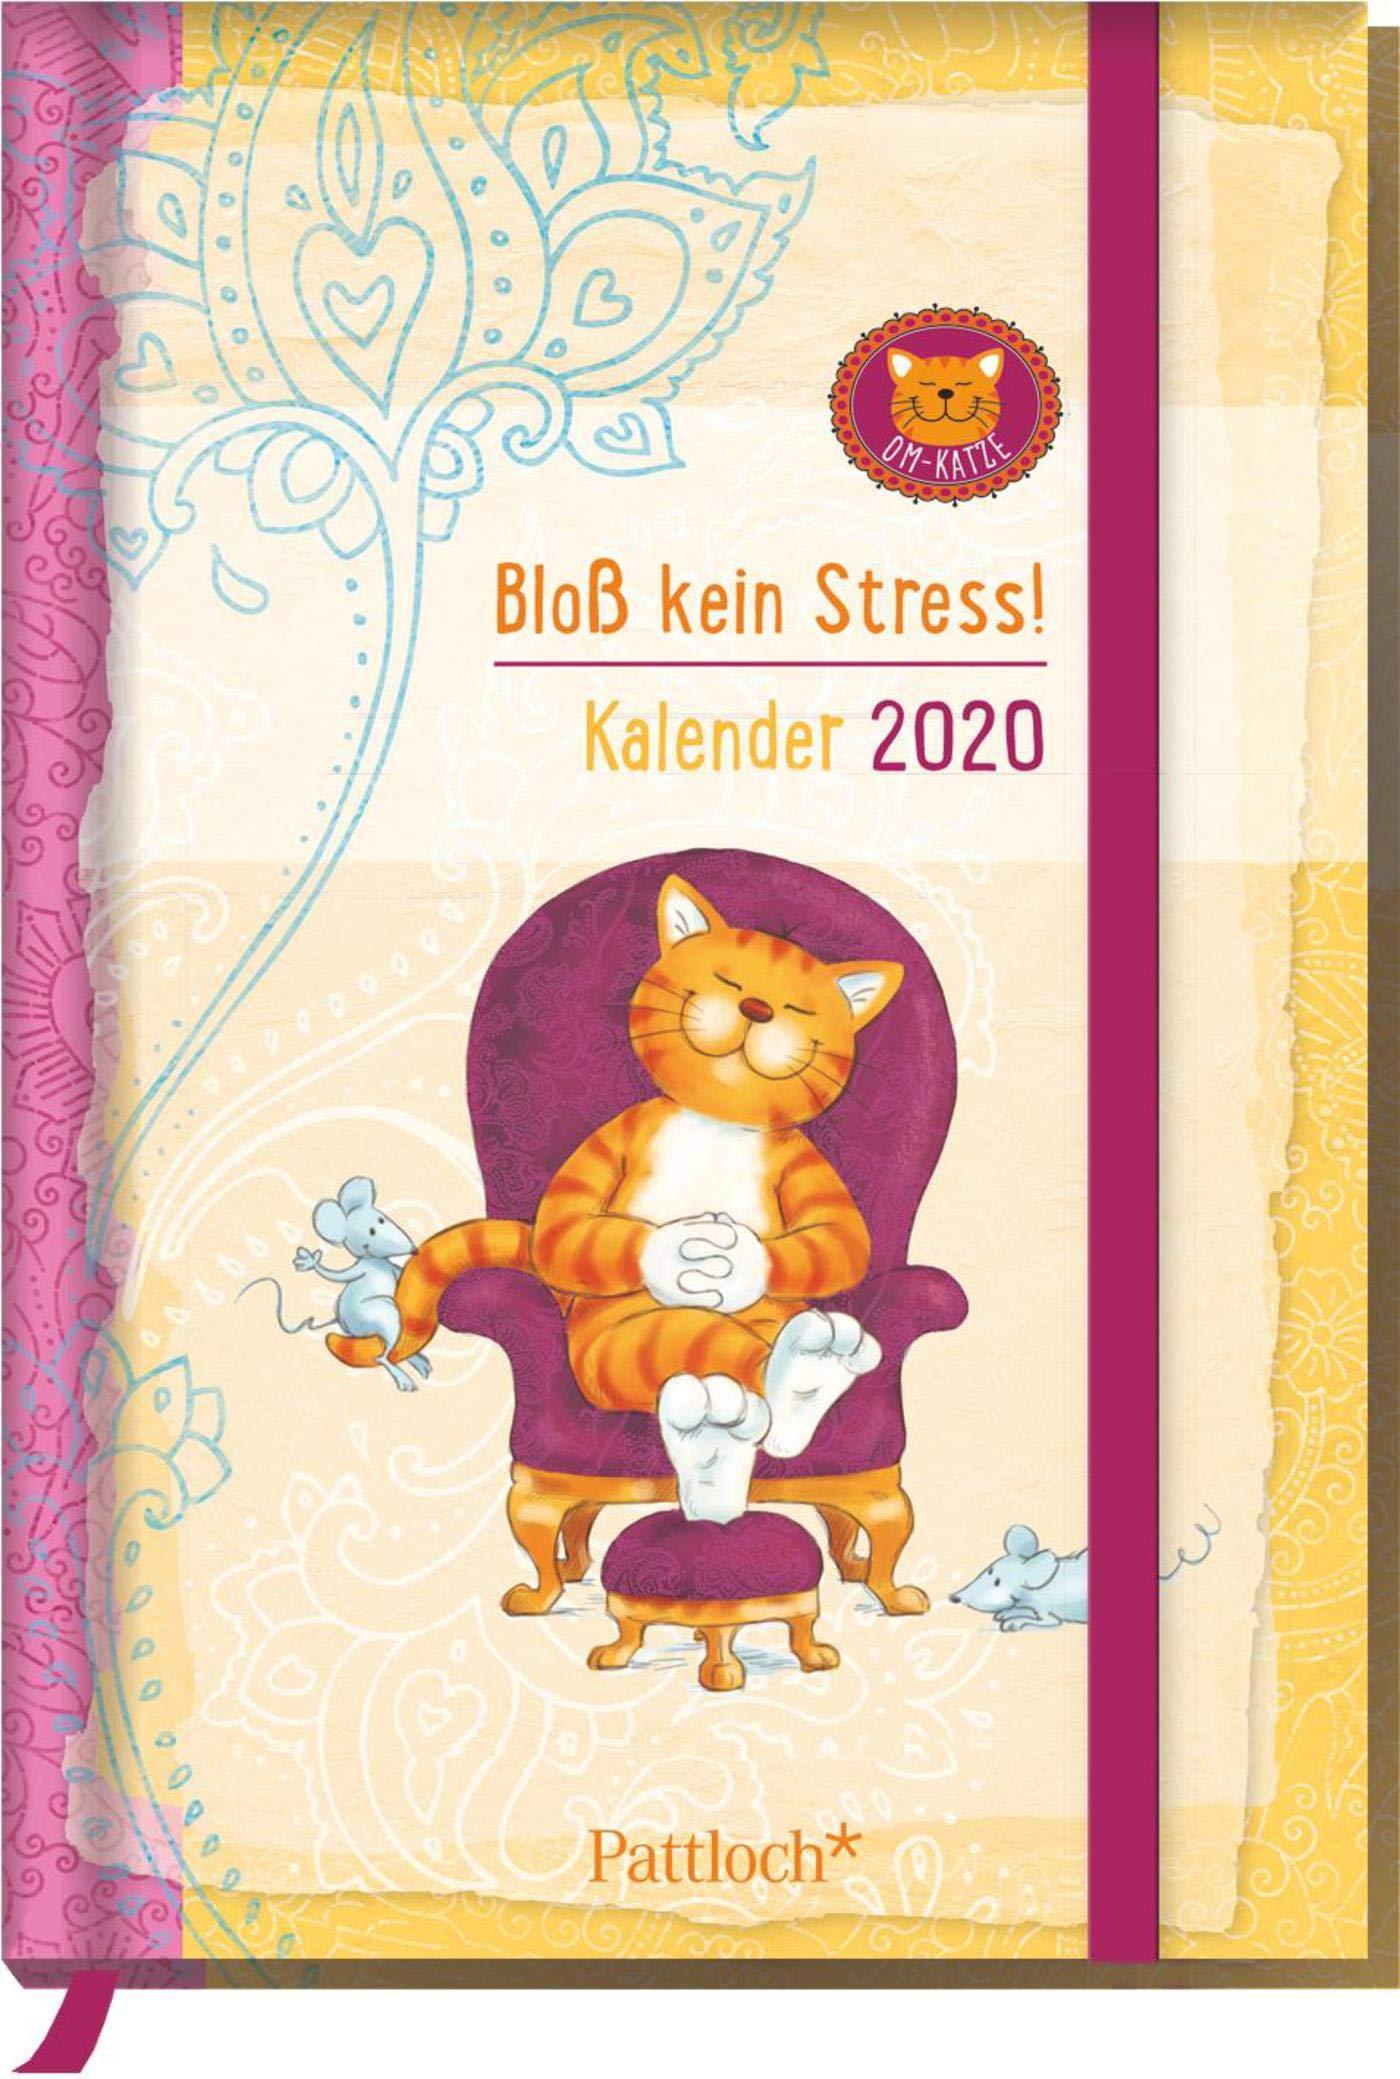 U Of M Calendar 2020 Om Katze: Bloß kein Stress! Buchkalender 2020: Terminkalender m